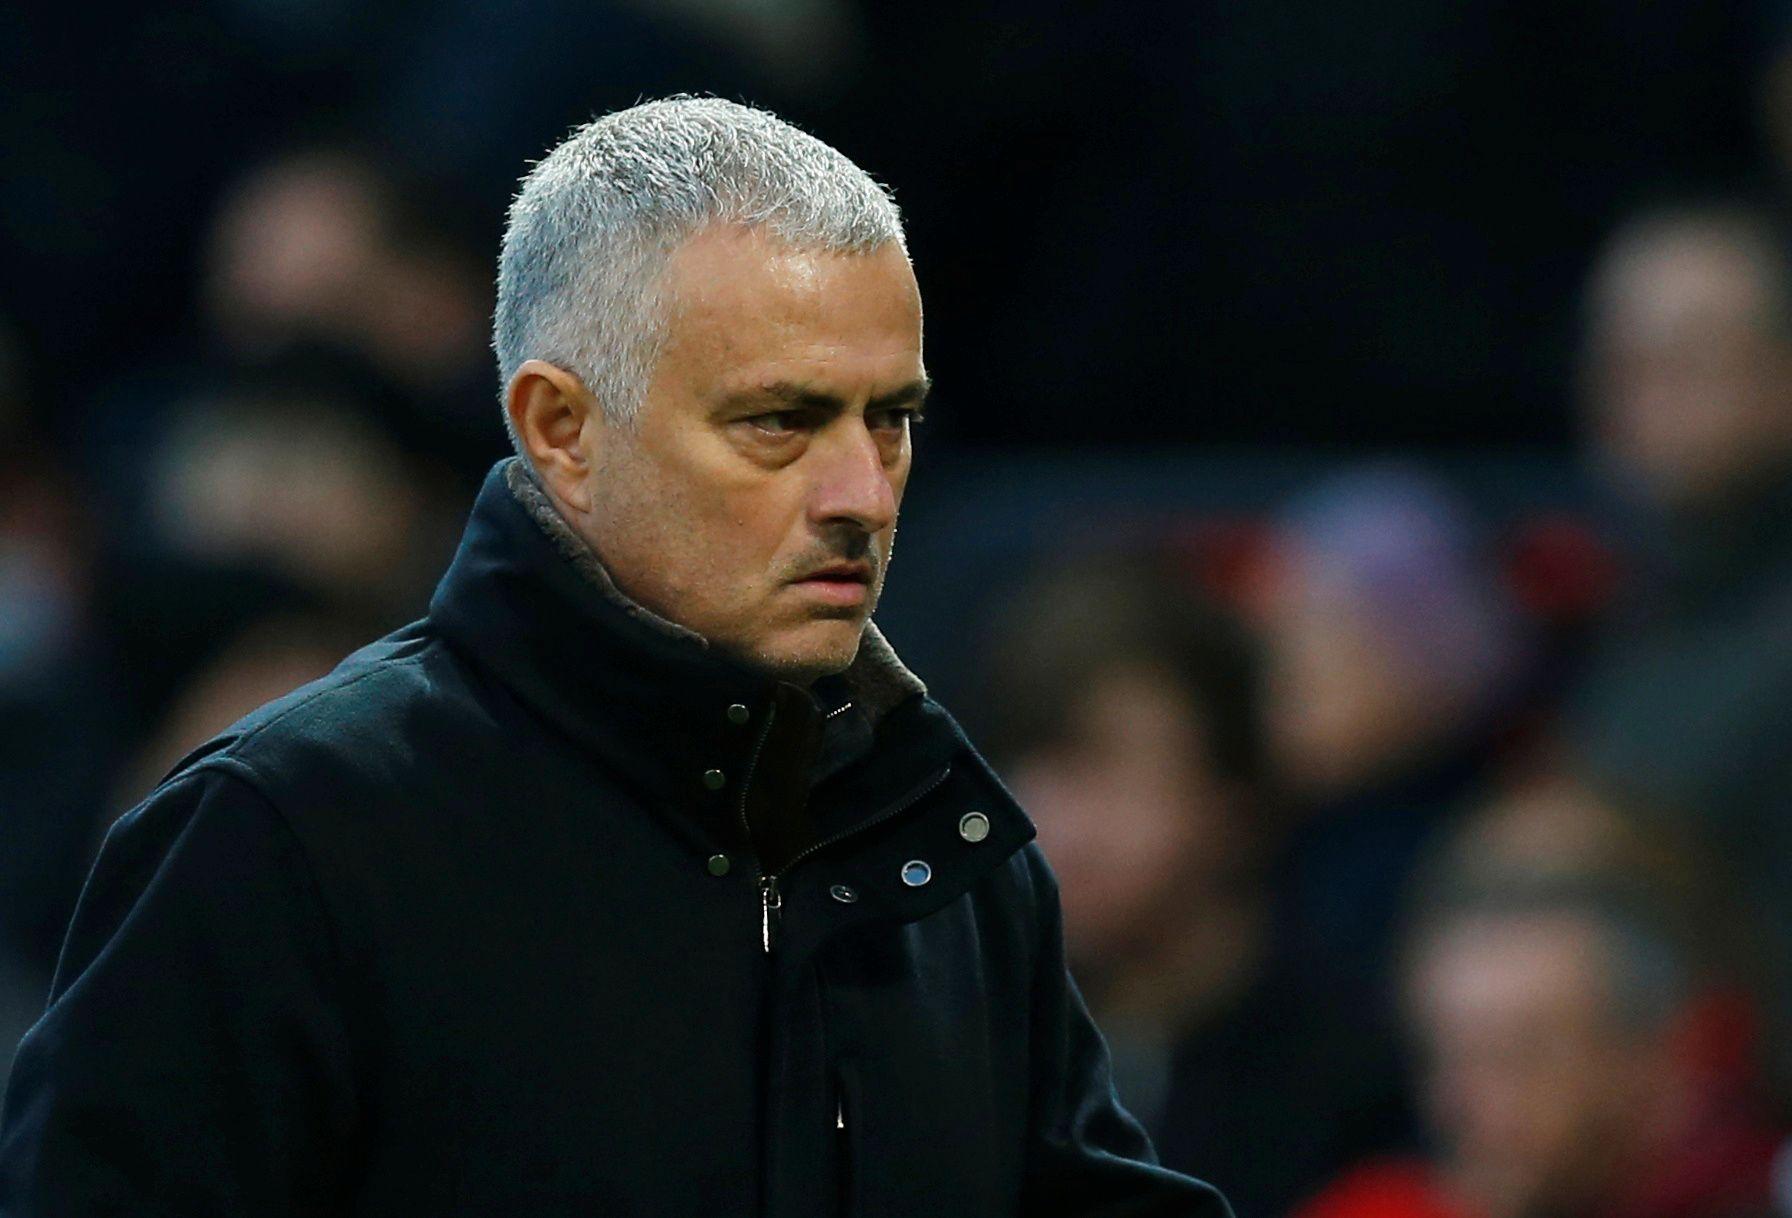 FERDIG: José Mourinho er ikke lenger manager for Manchester United.